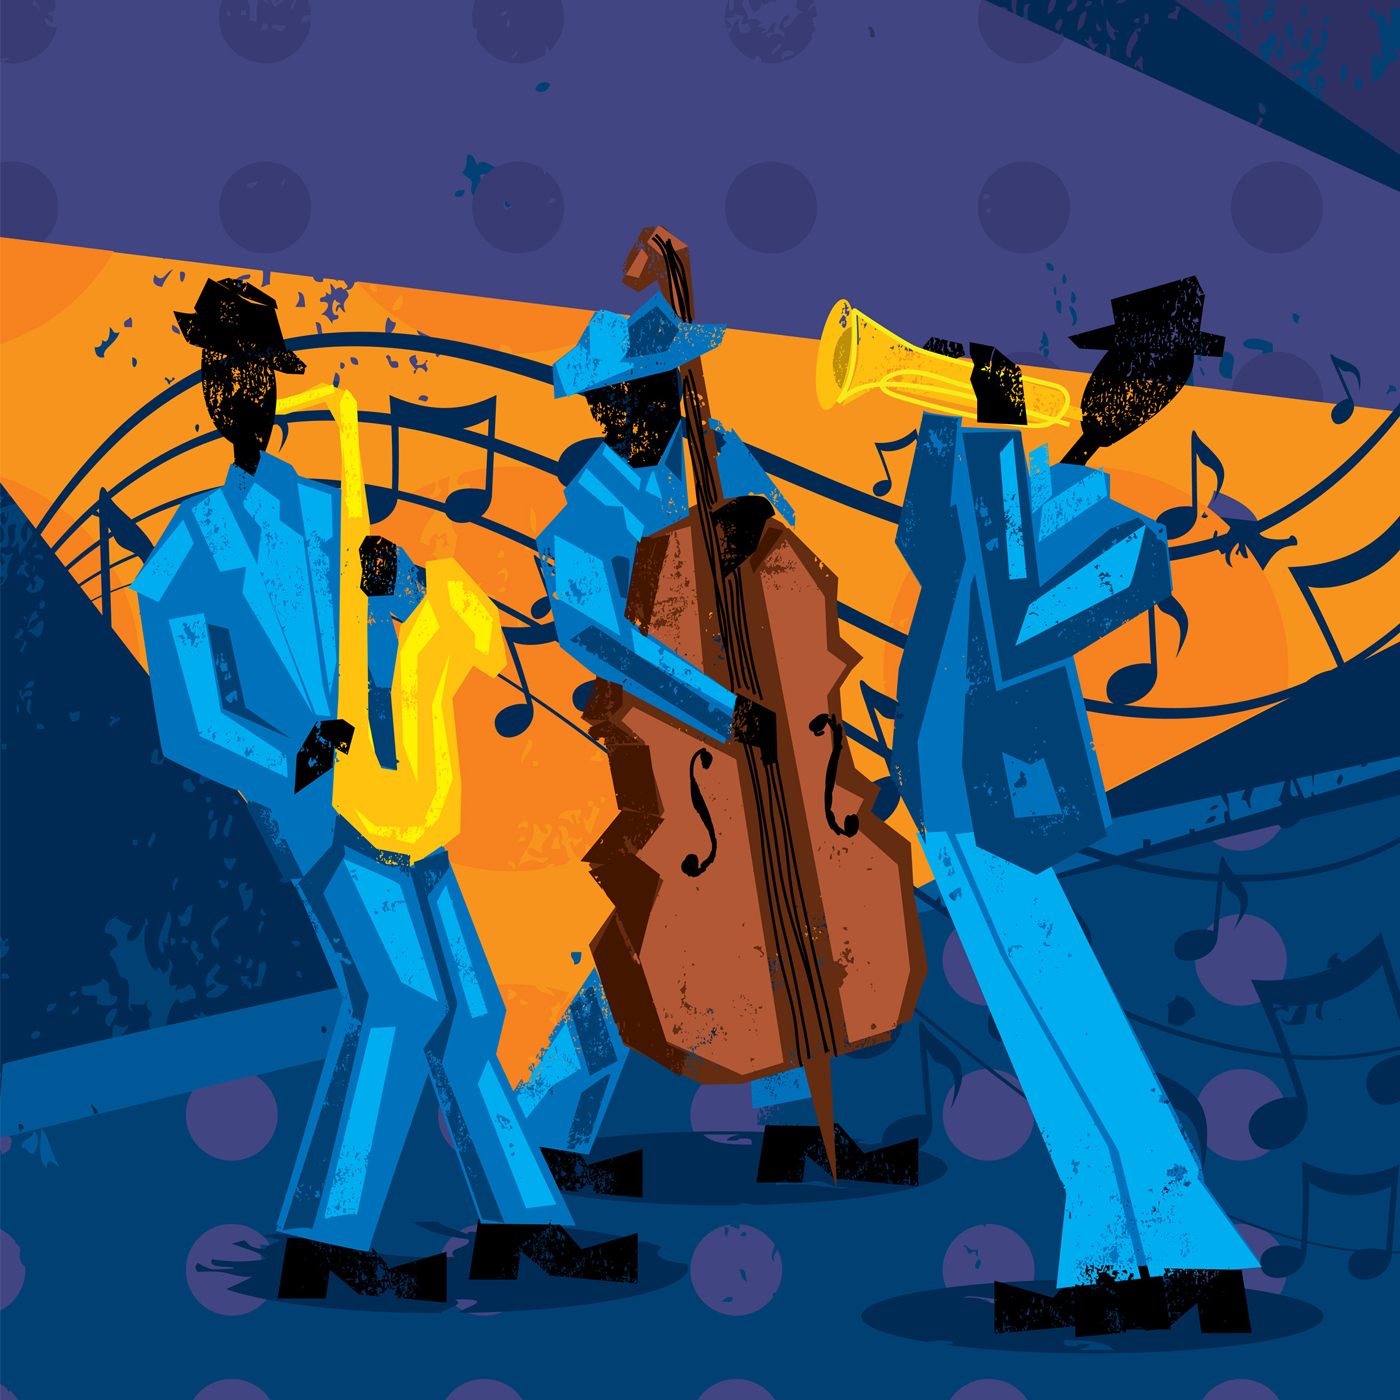 bebop jazz on radiotunes radiotunes enjoy amazing free internet